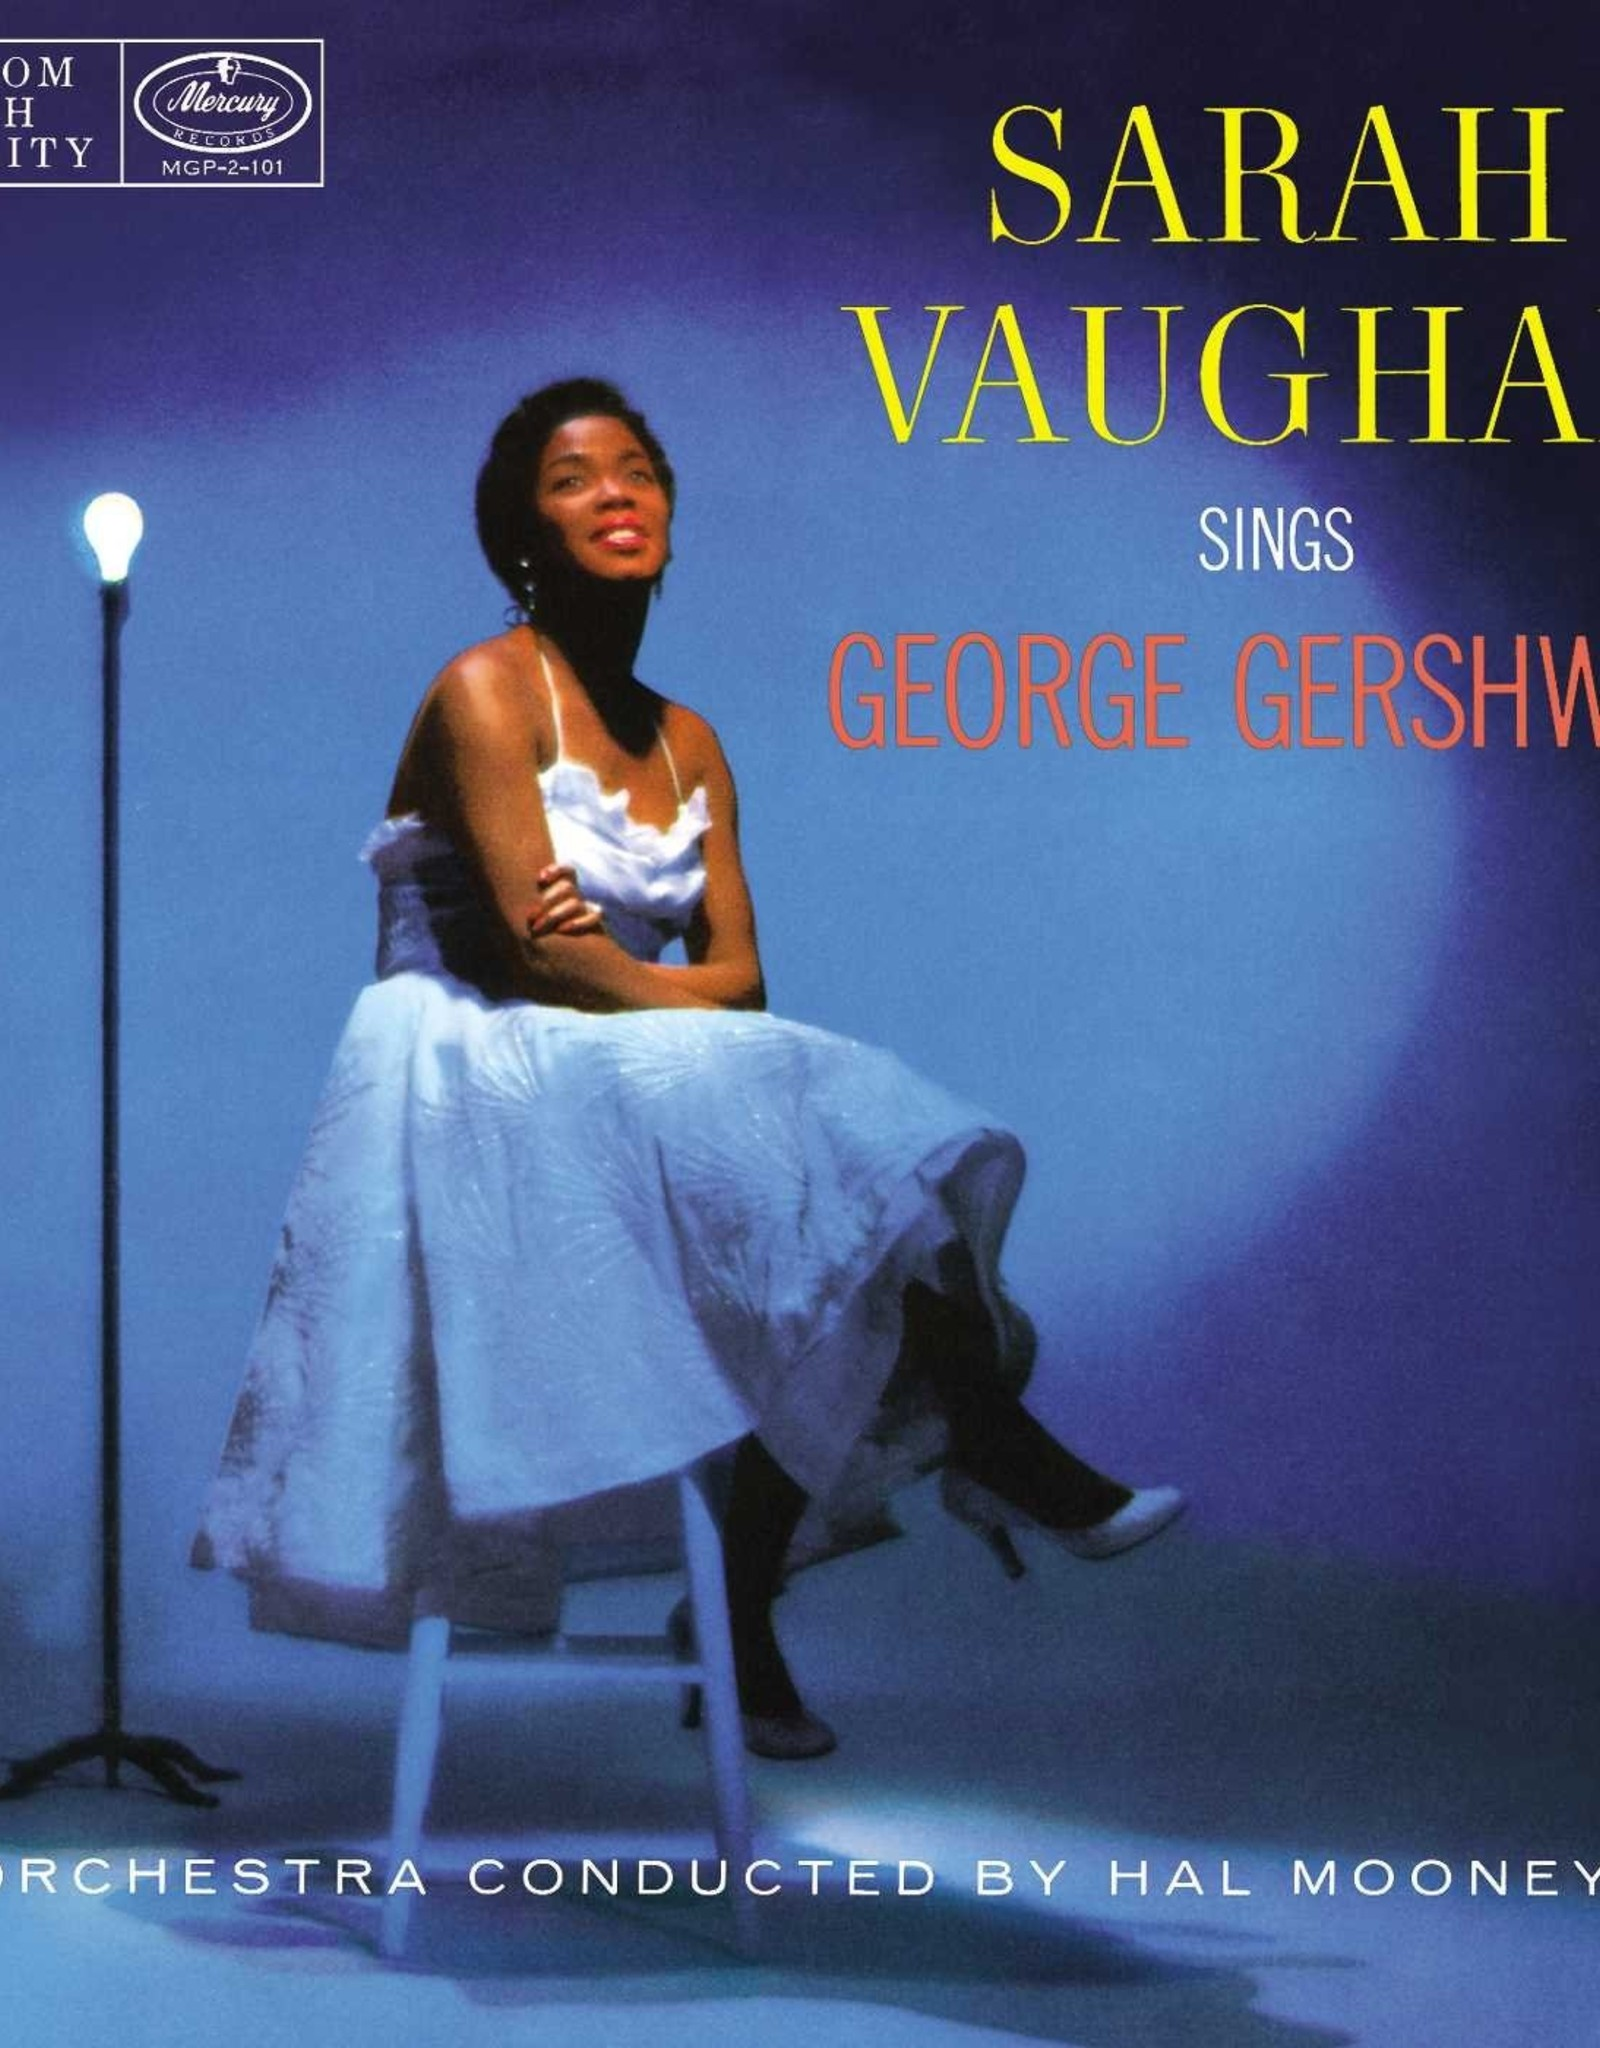 Sarah Vaughan - Sarah Vaughan Sings George Gershwin